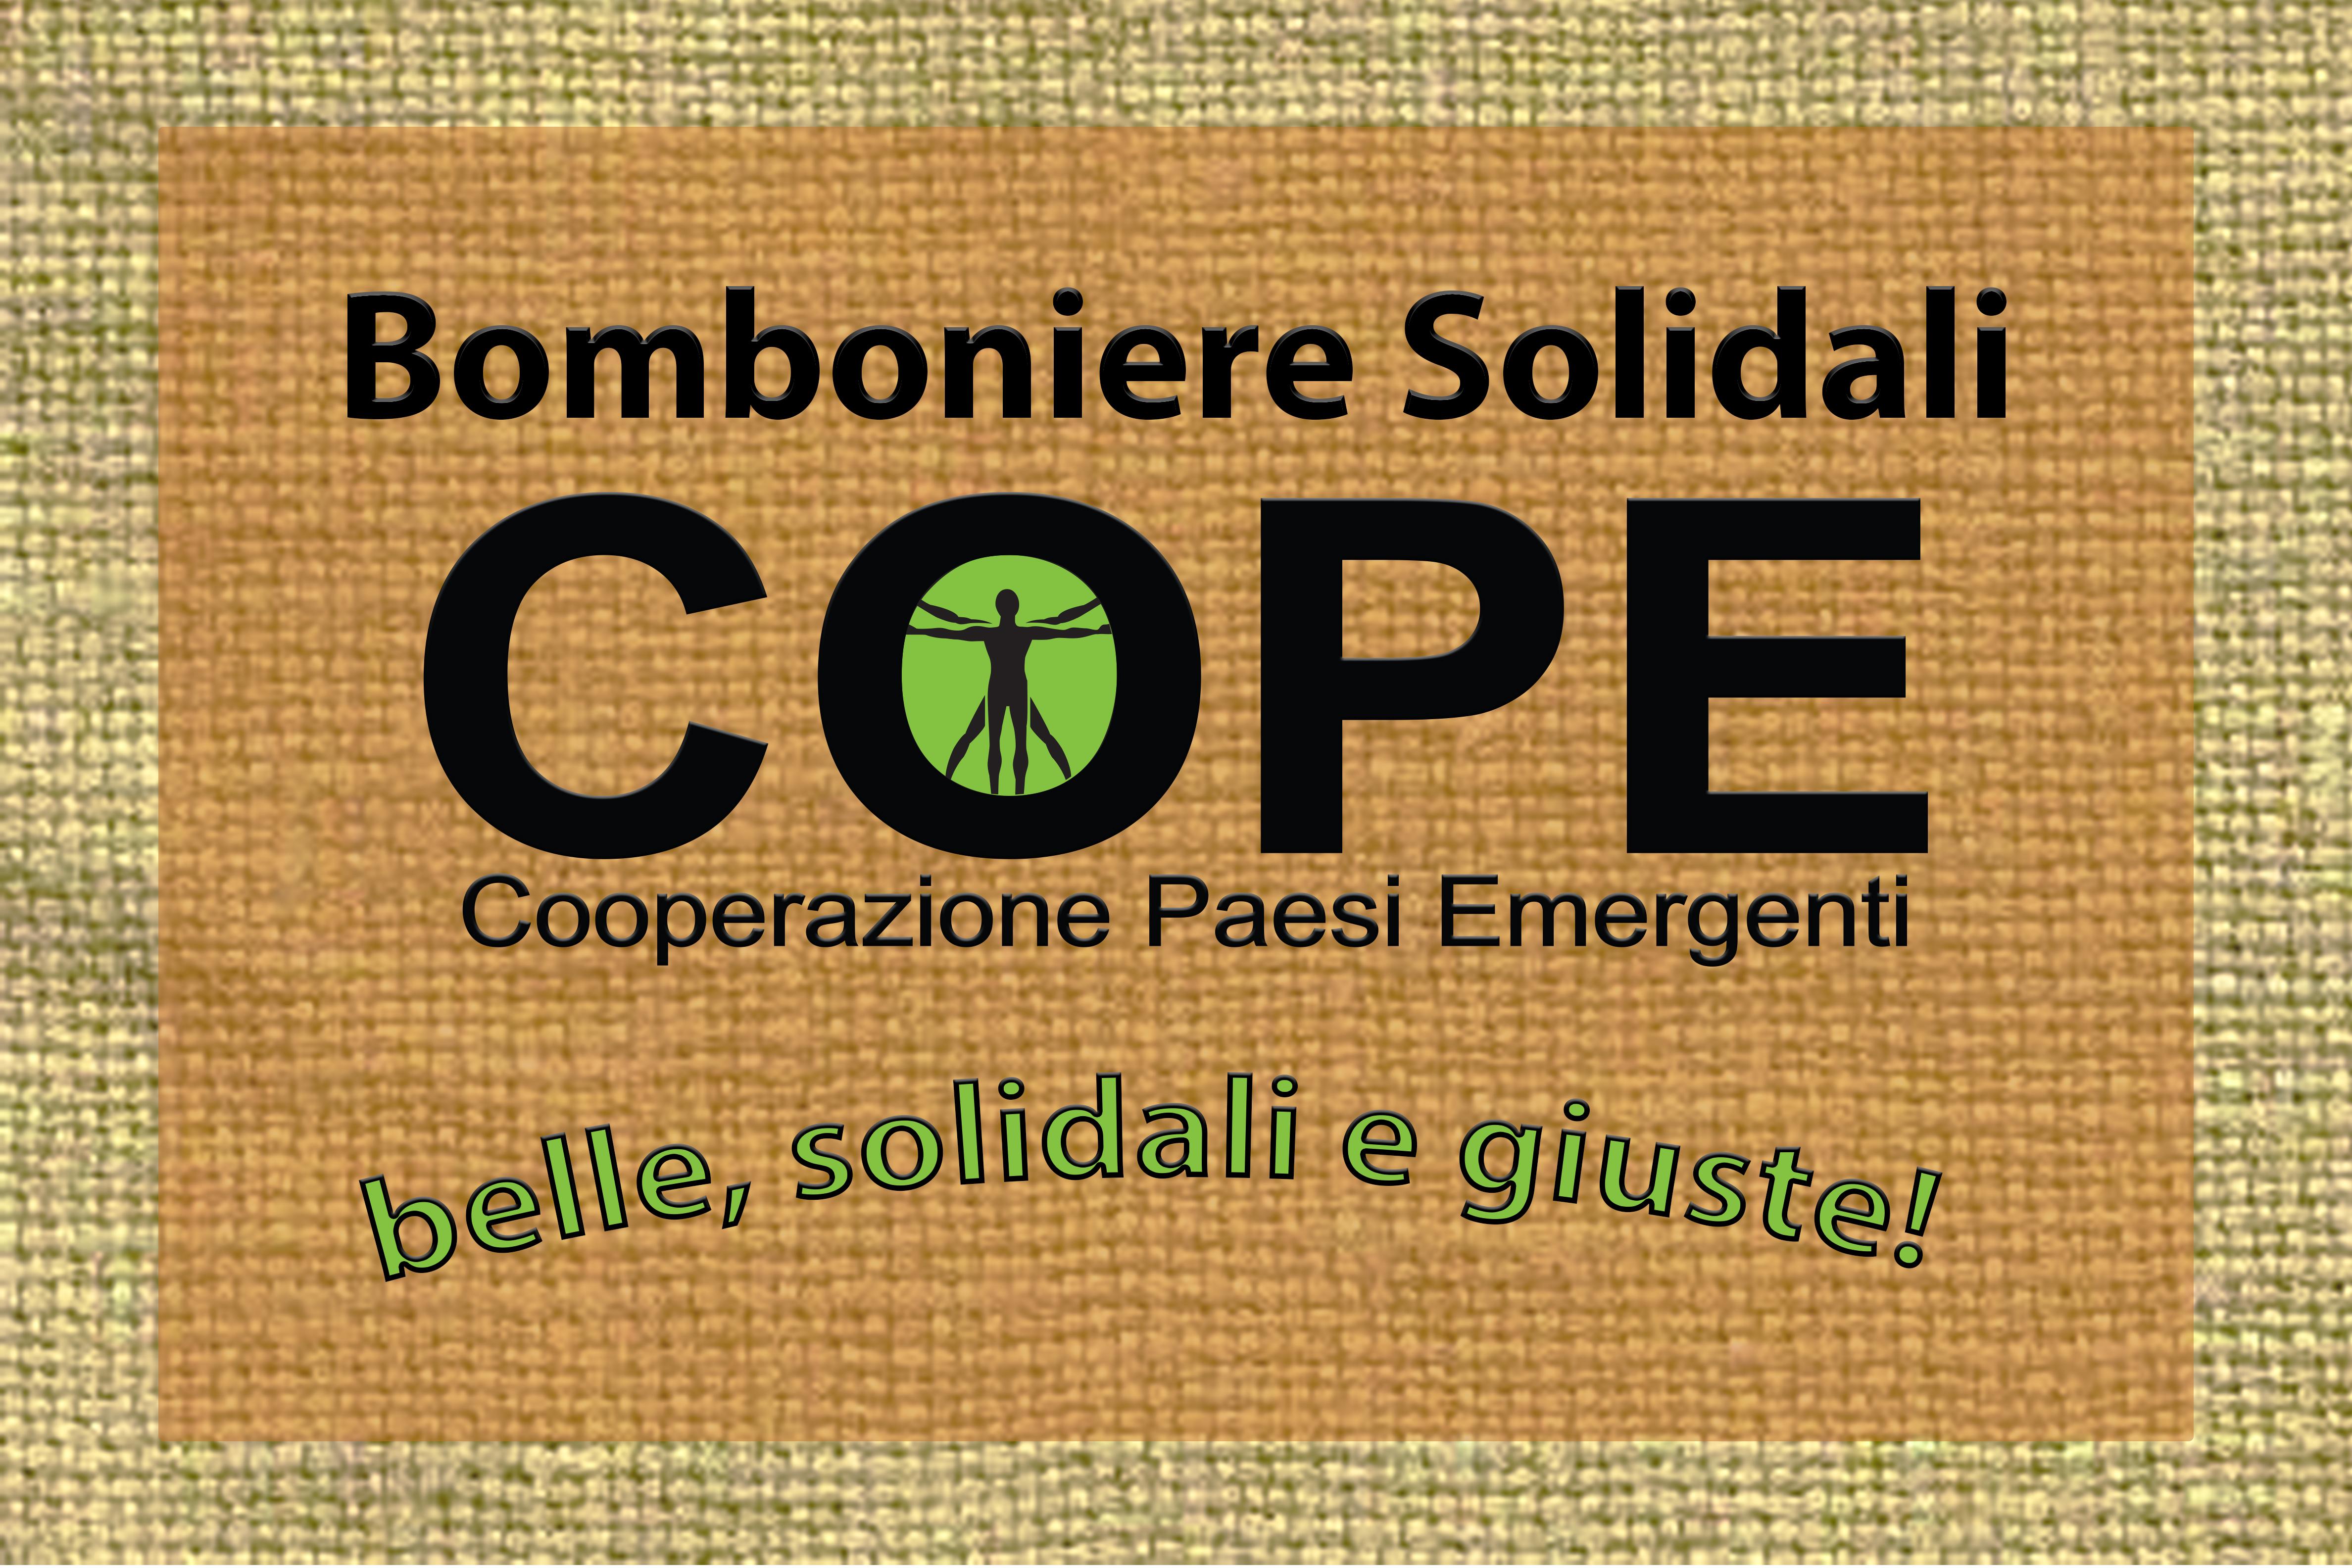 Bomboniere Solidali